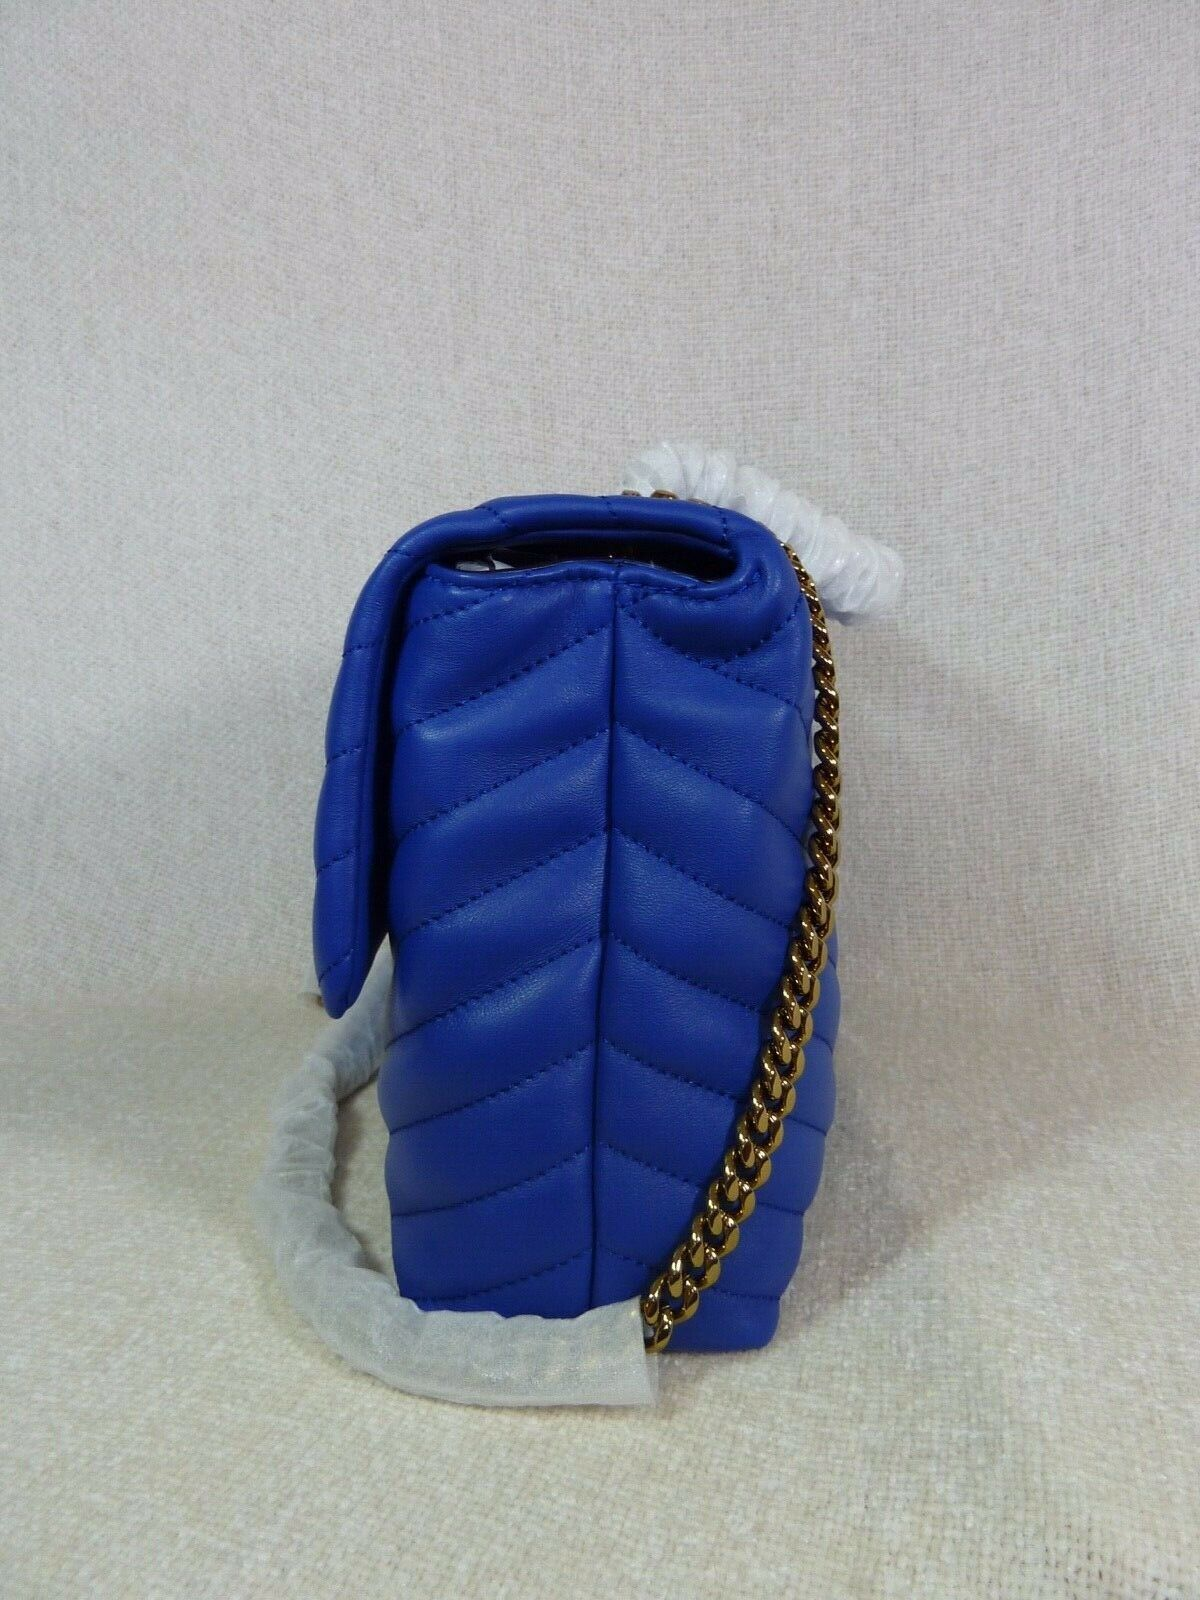 NWT Tory Burch Nautical Blue Kira Chevron Convertible Shoulder Bag image 5